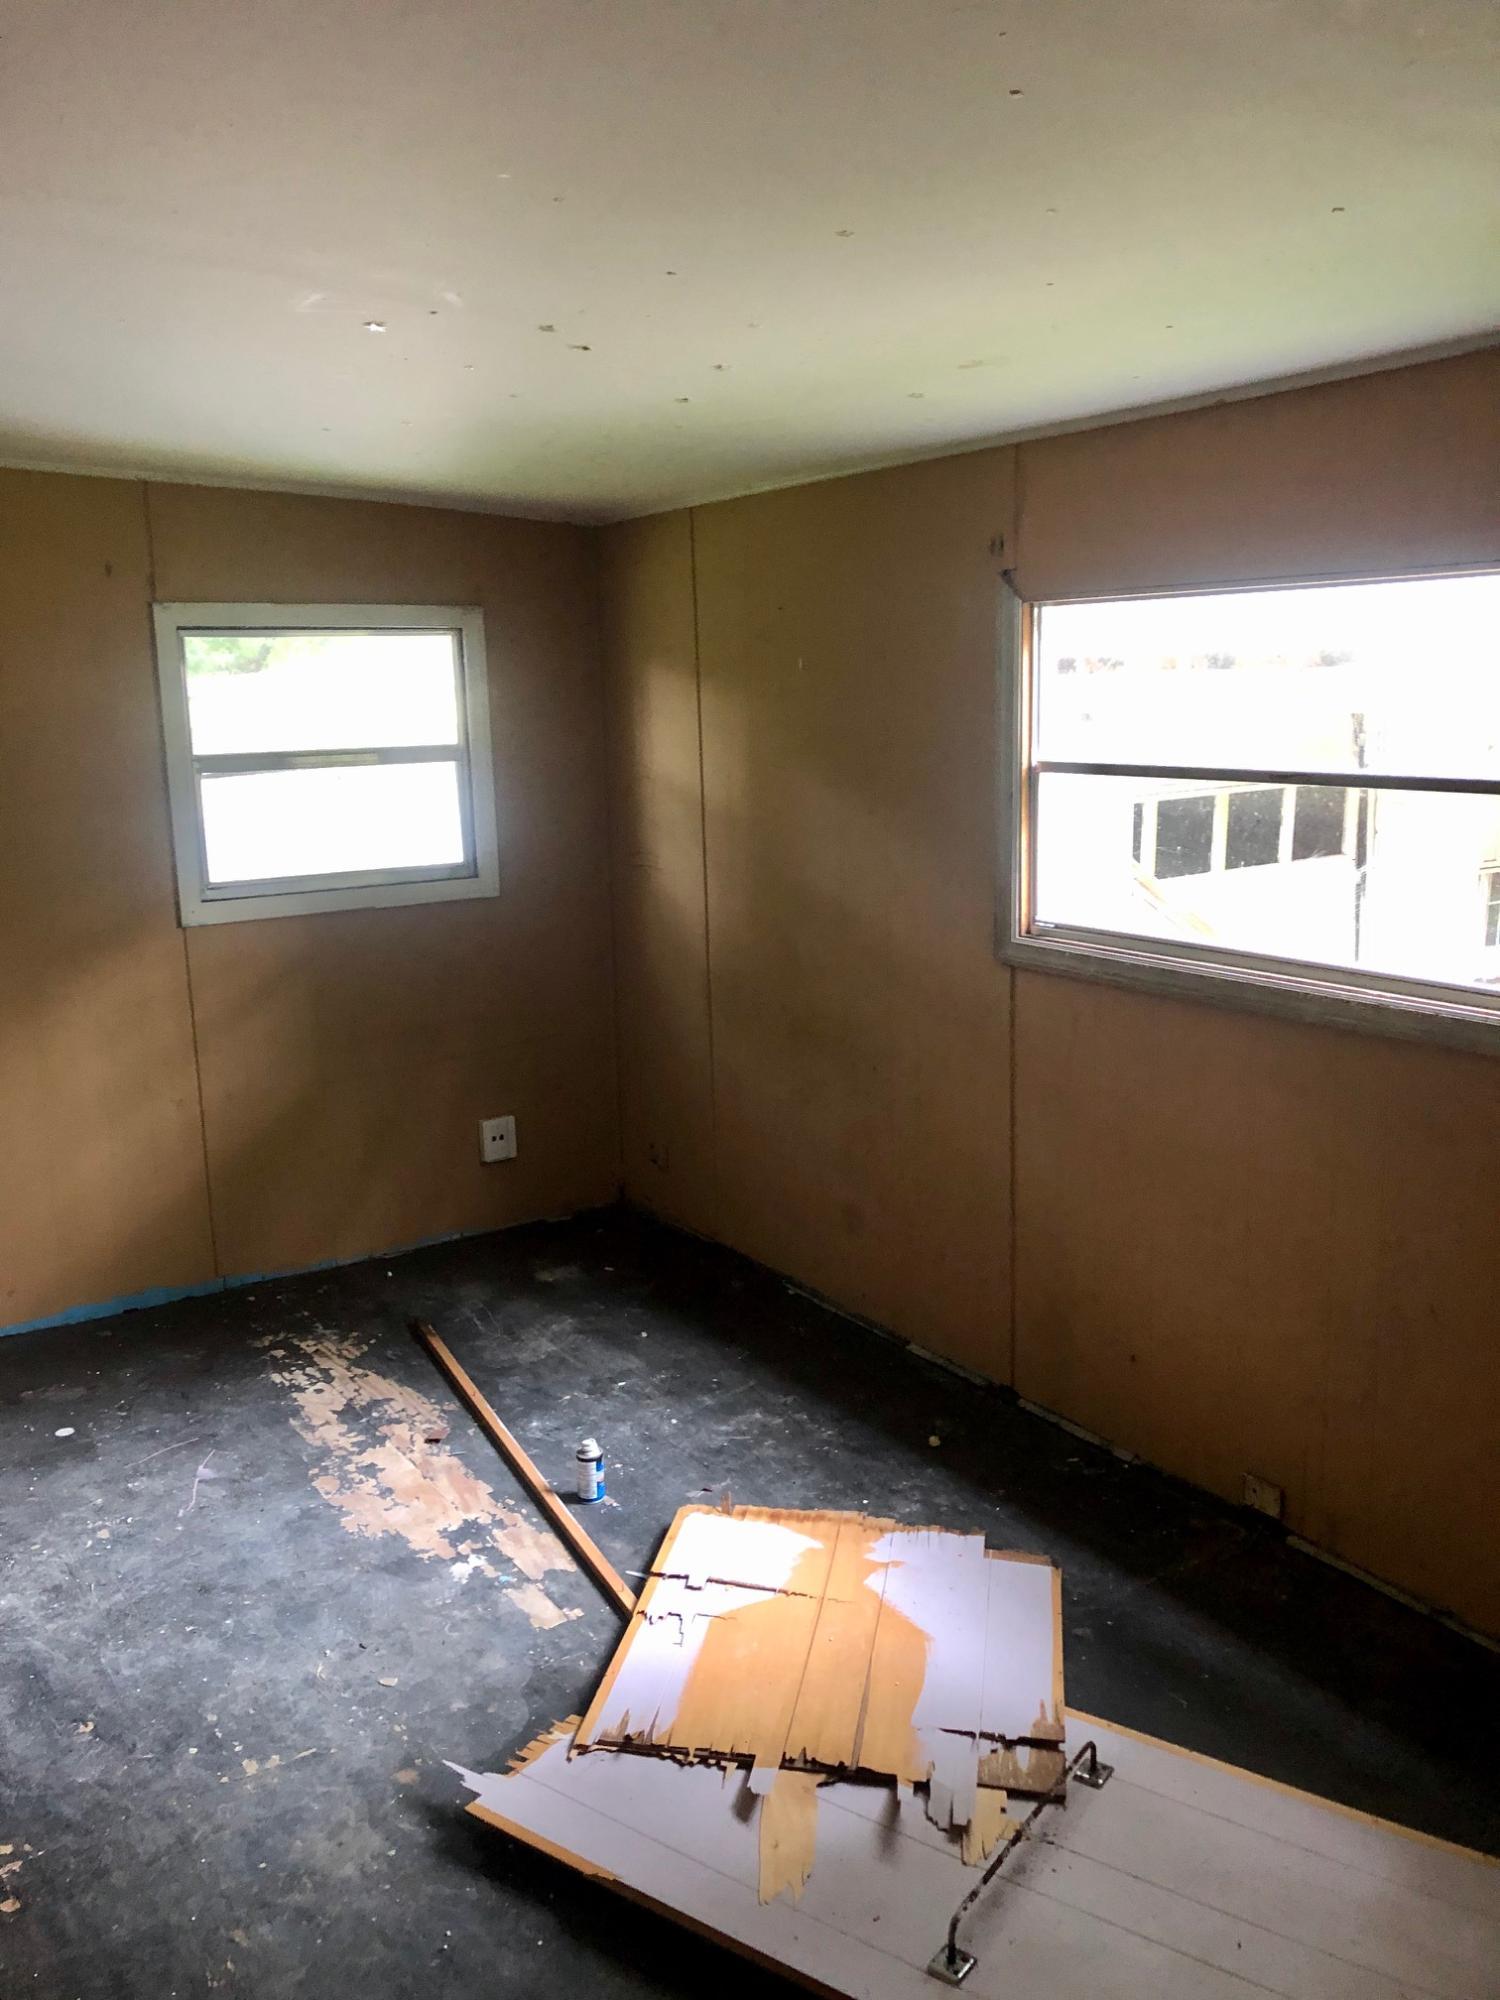 Burbage Acres Homes For Sale - 2191 Sweetgum, Charleston, SC - 0